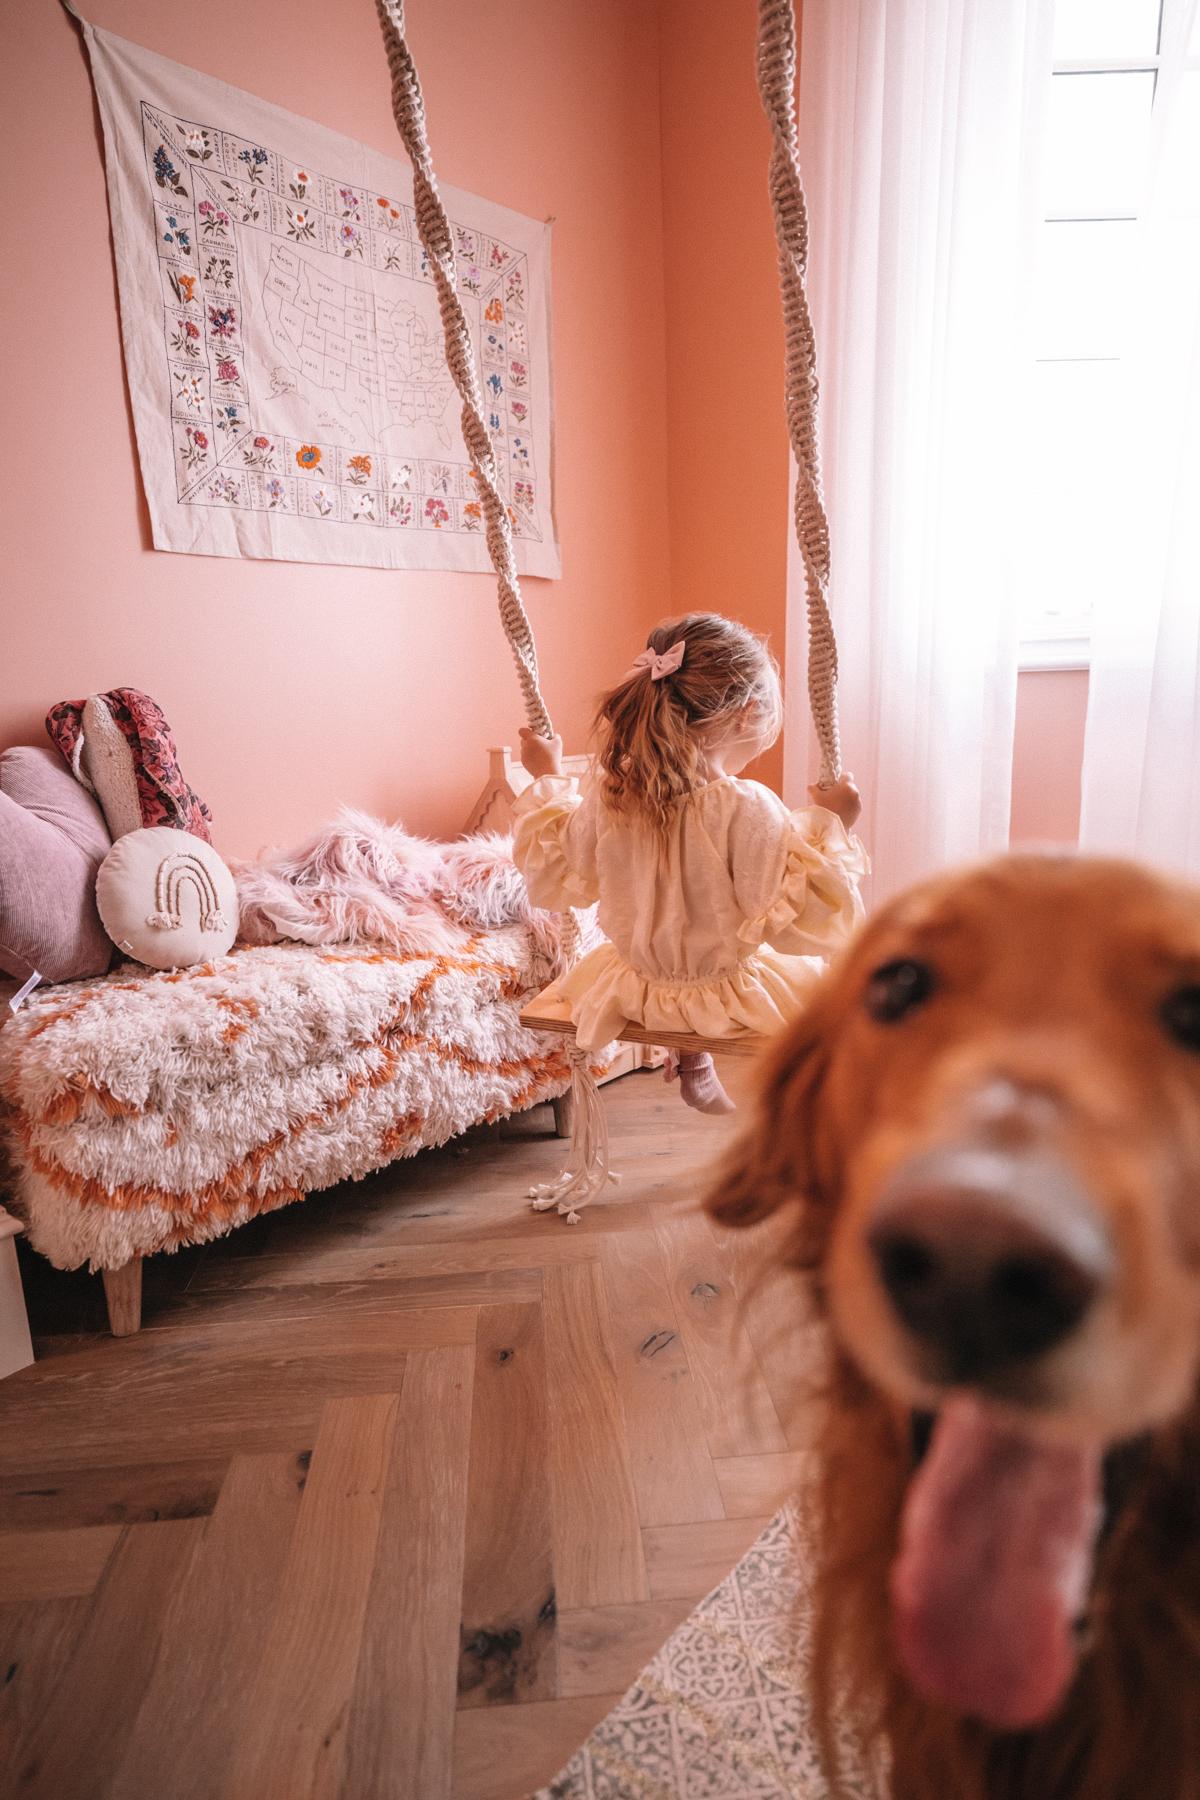 Sunday Swinging in Rosie's Room. Rosie swinging in her bedroom with Chauncey. Barefoot Blonde | Amber Fillerup Clark